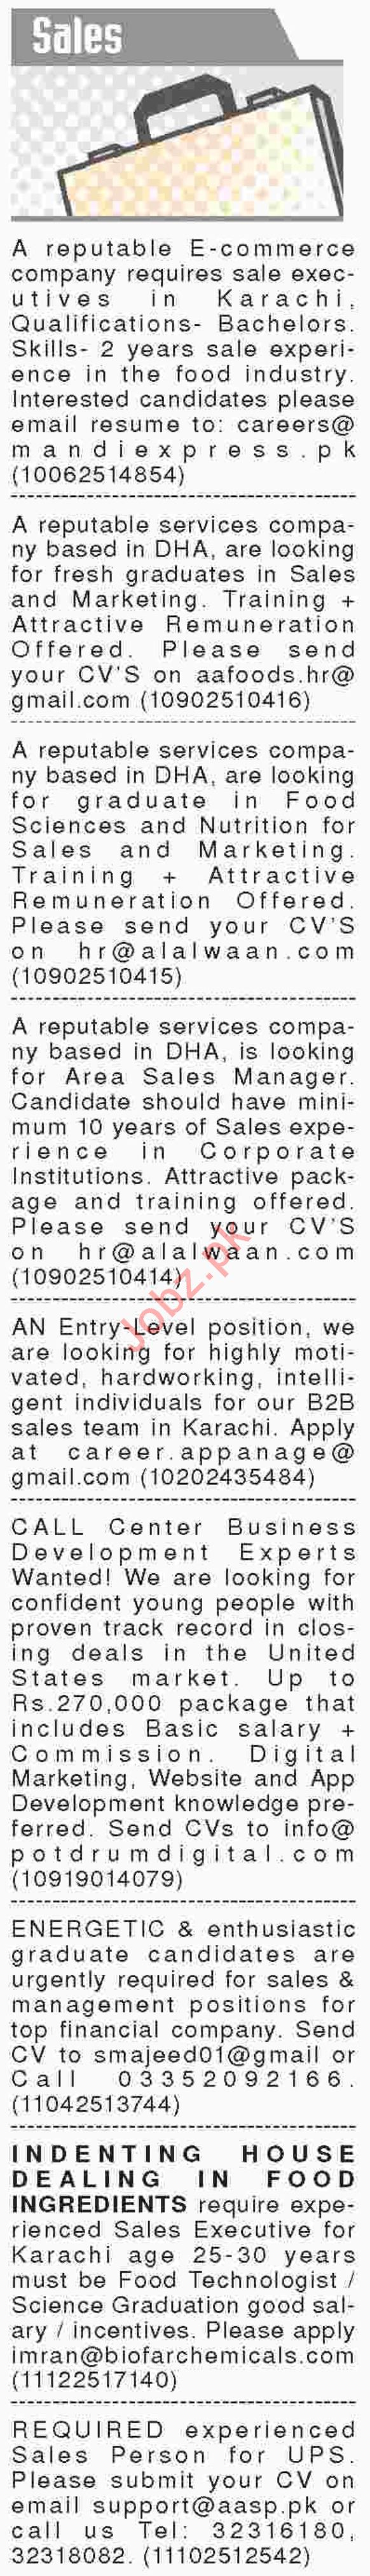 Dawn Sunday Newspaper Sales Classified Ads 23/12/2018